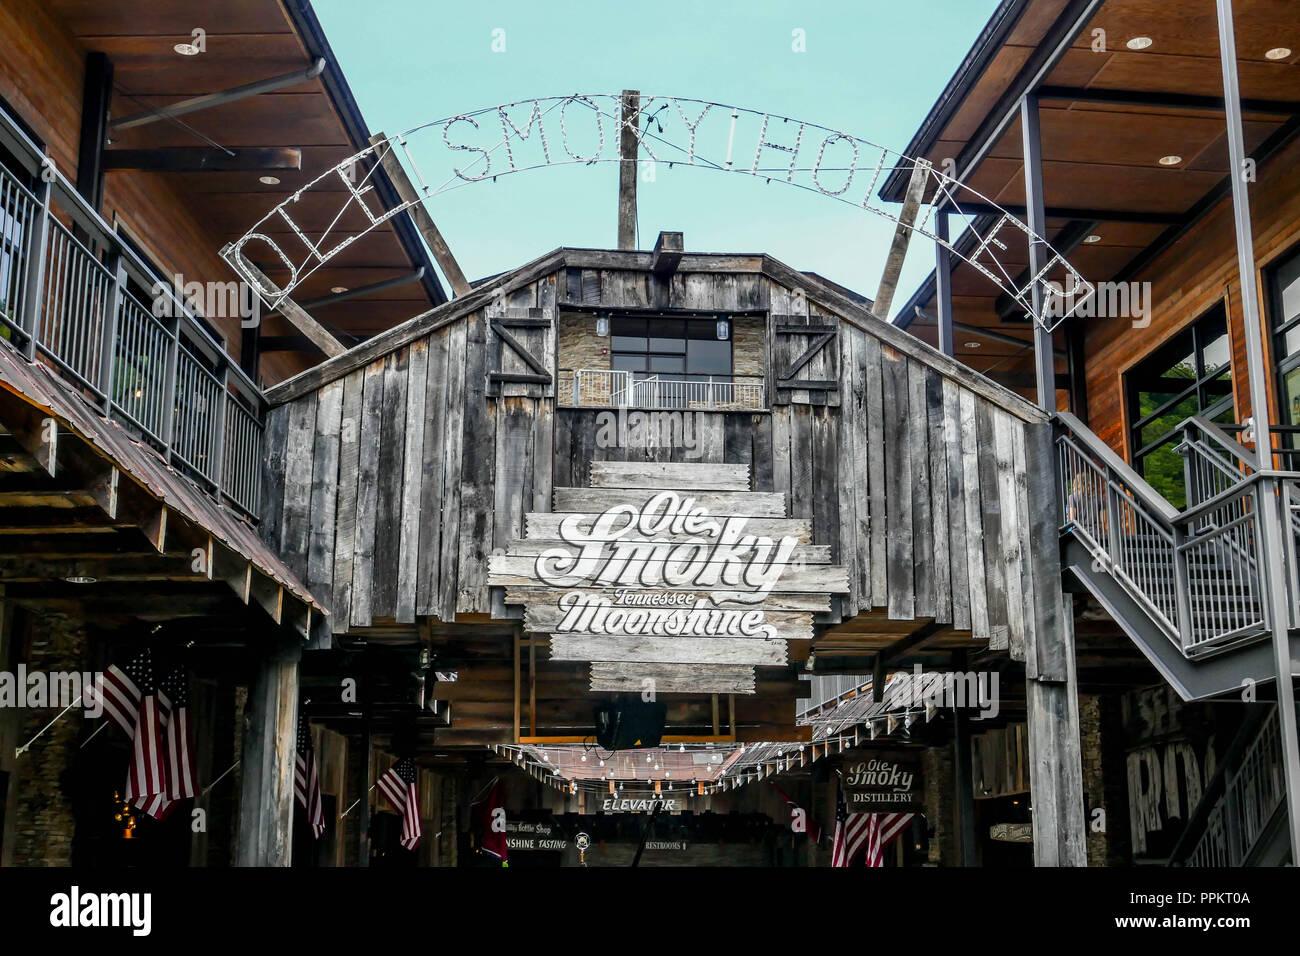 GATLINBURG-AUGUST 8:  Ole Smoky Moonshine tasting building in Gatlinburg, Tennessee, USA on August 8, 2016. - Stock Image